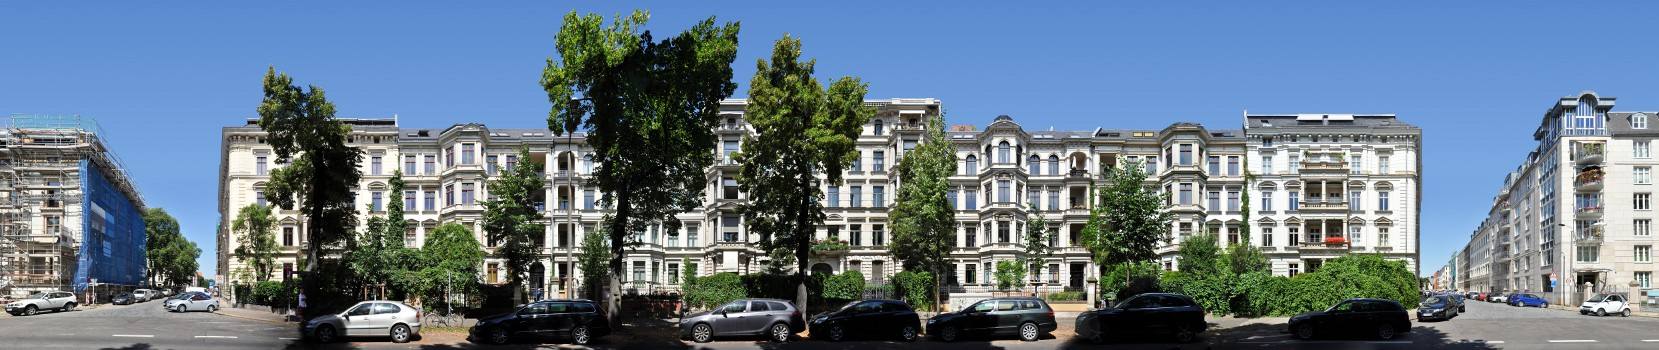 Ferdinand-Lassalle-Straße